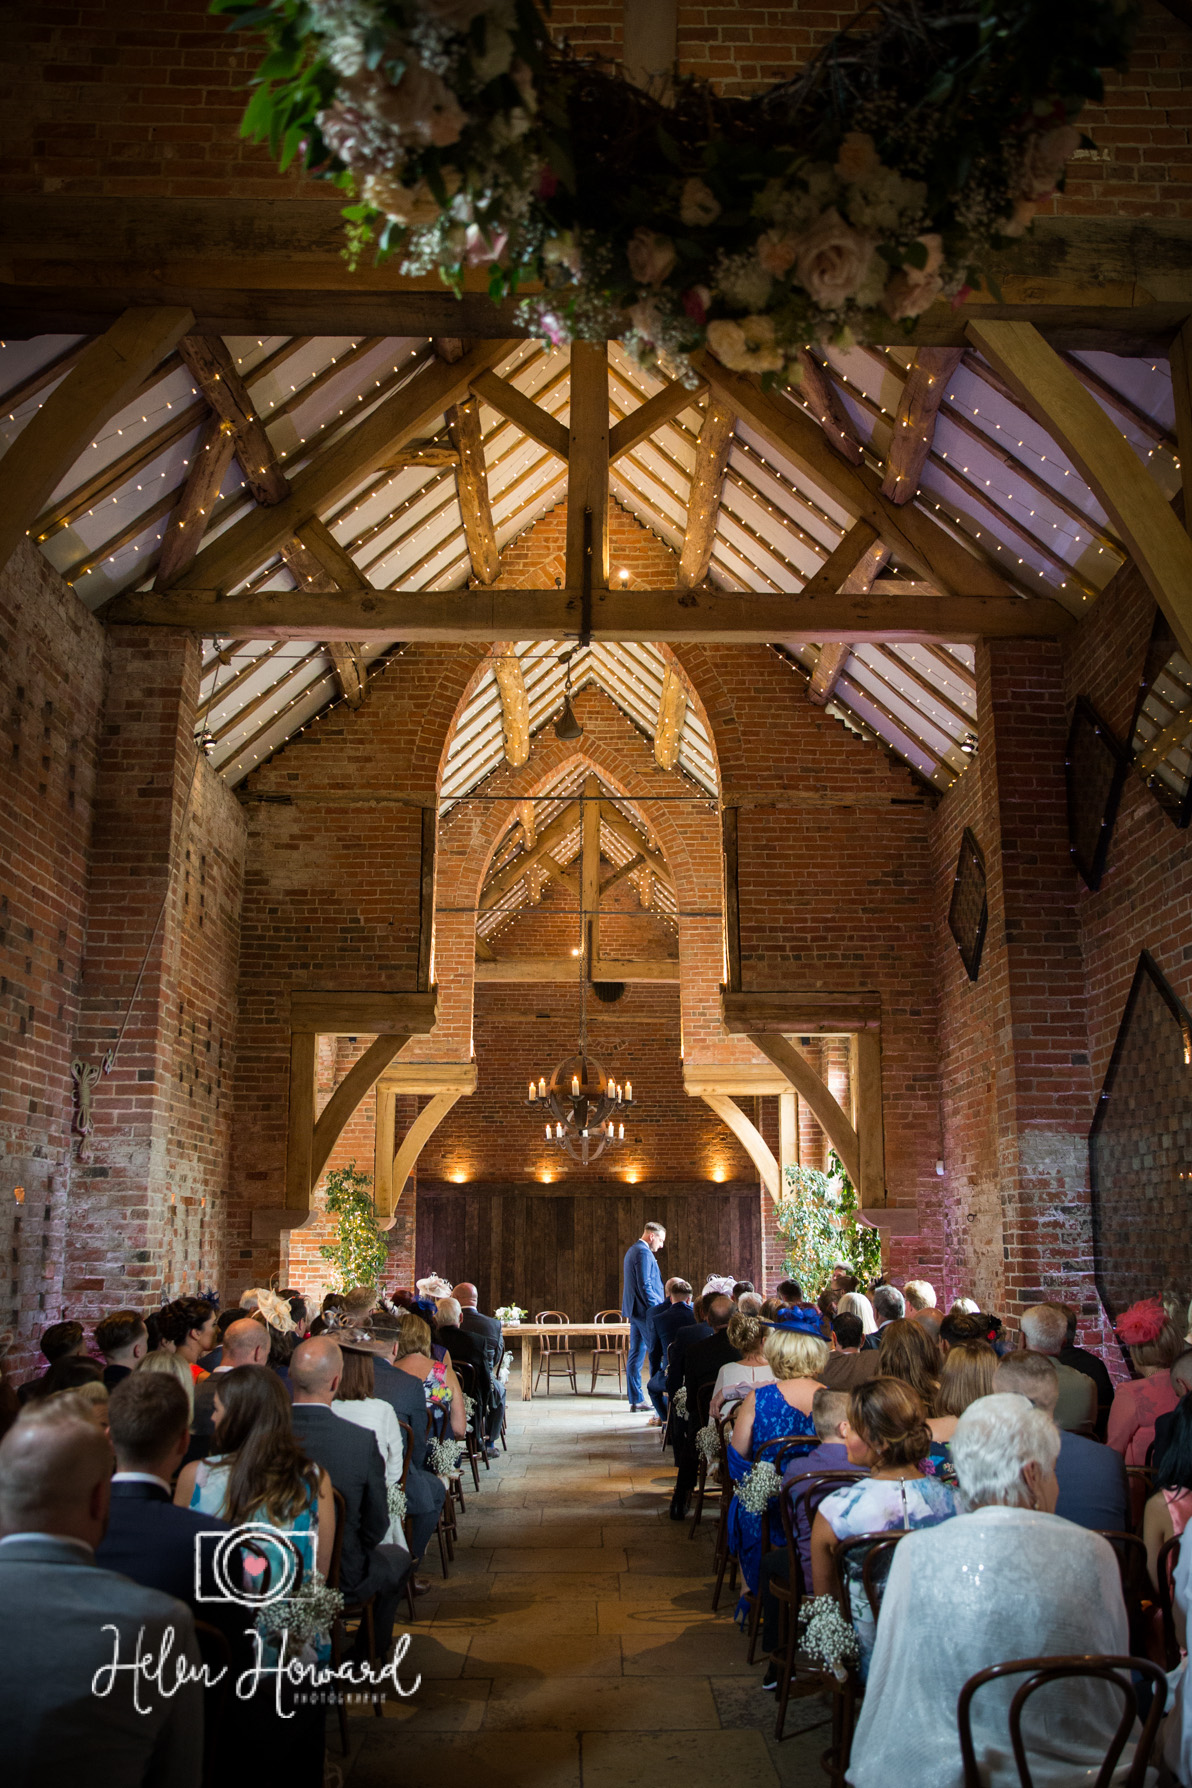 Shustoke Farm Barns Wedding Photography by Helen Howard-13.jpg